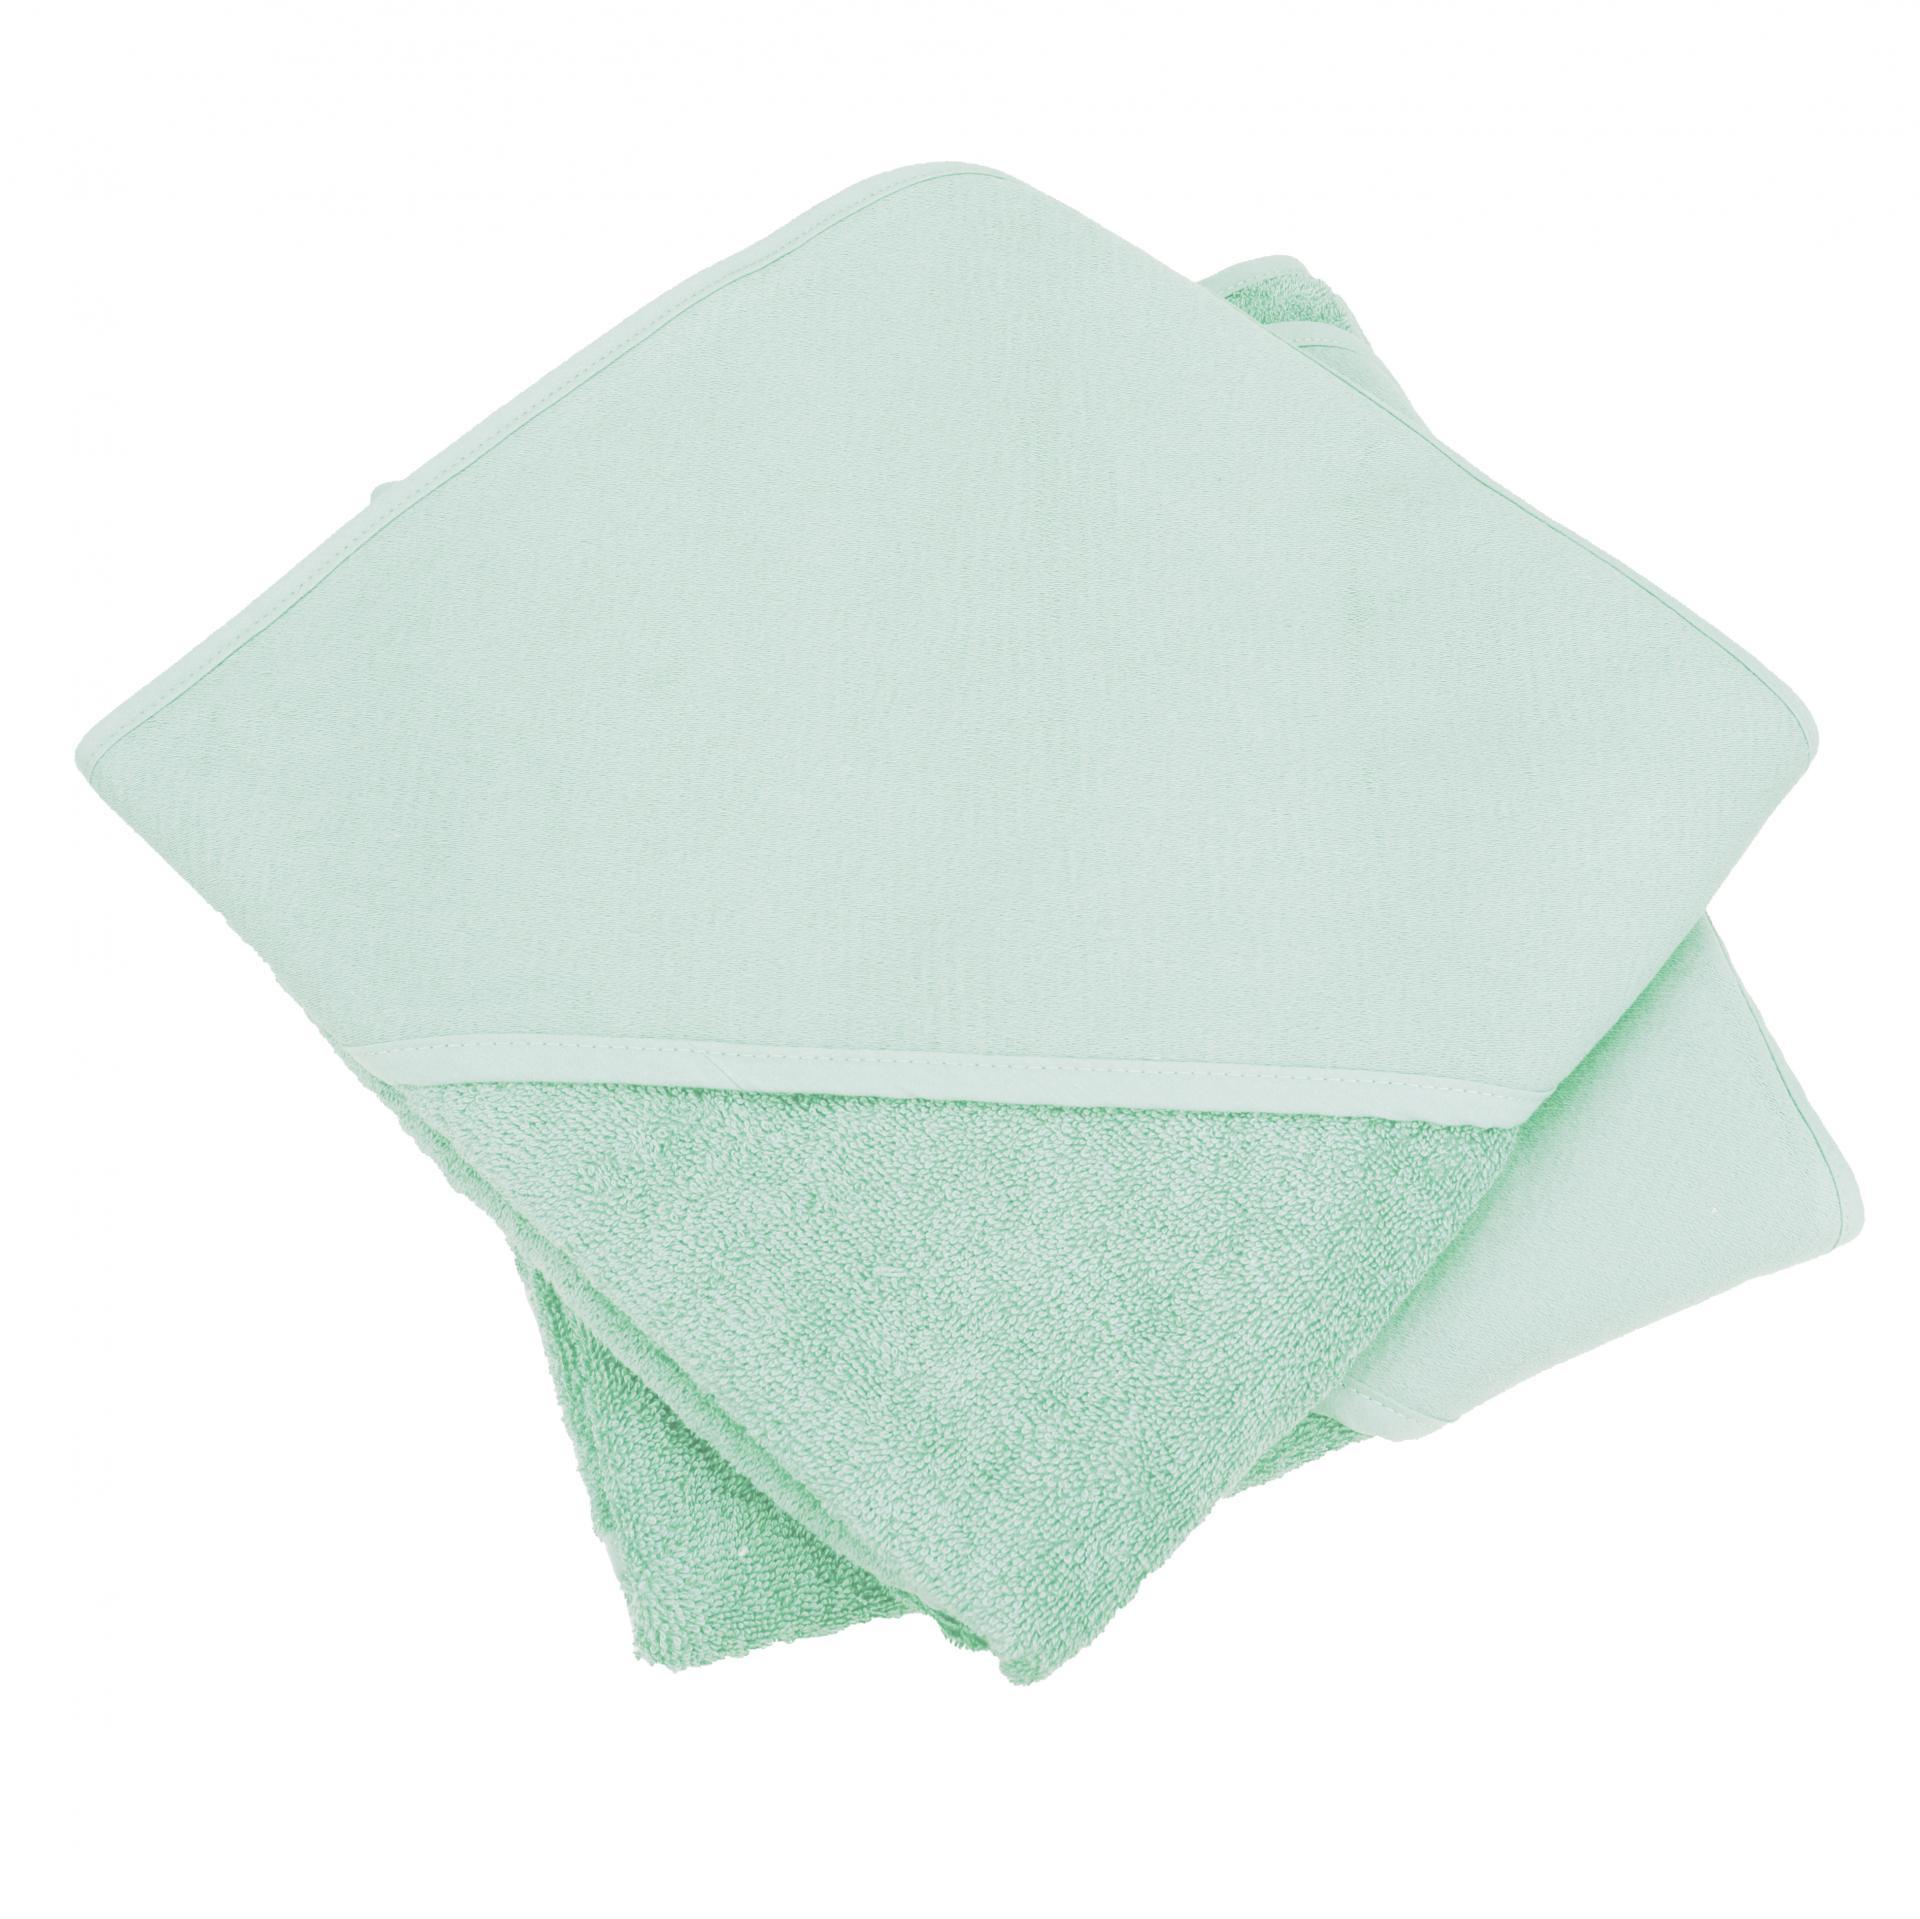 Ar732 mintgreen mintgreen ft